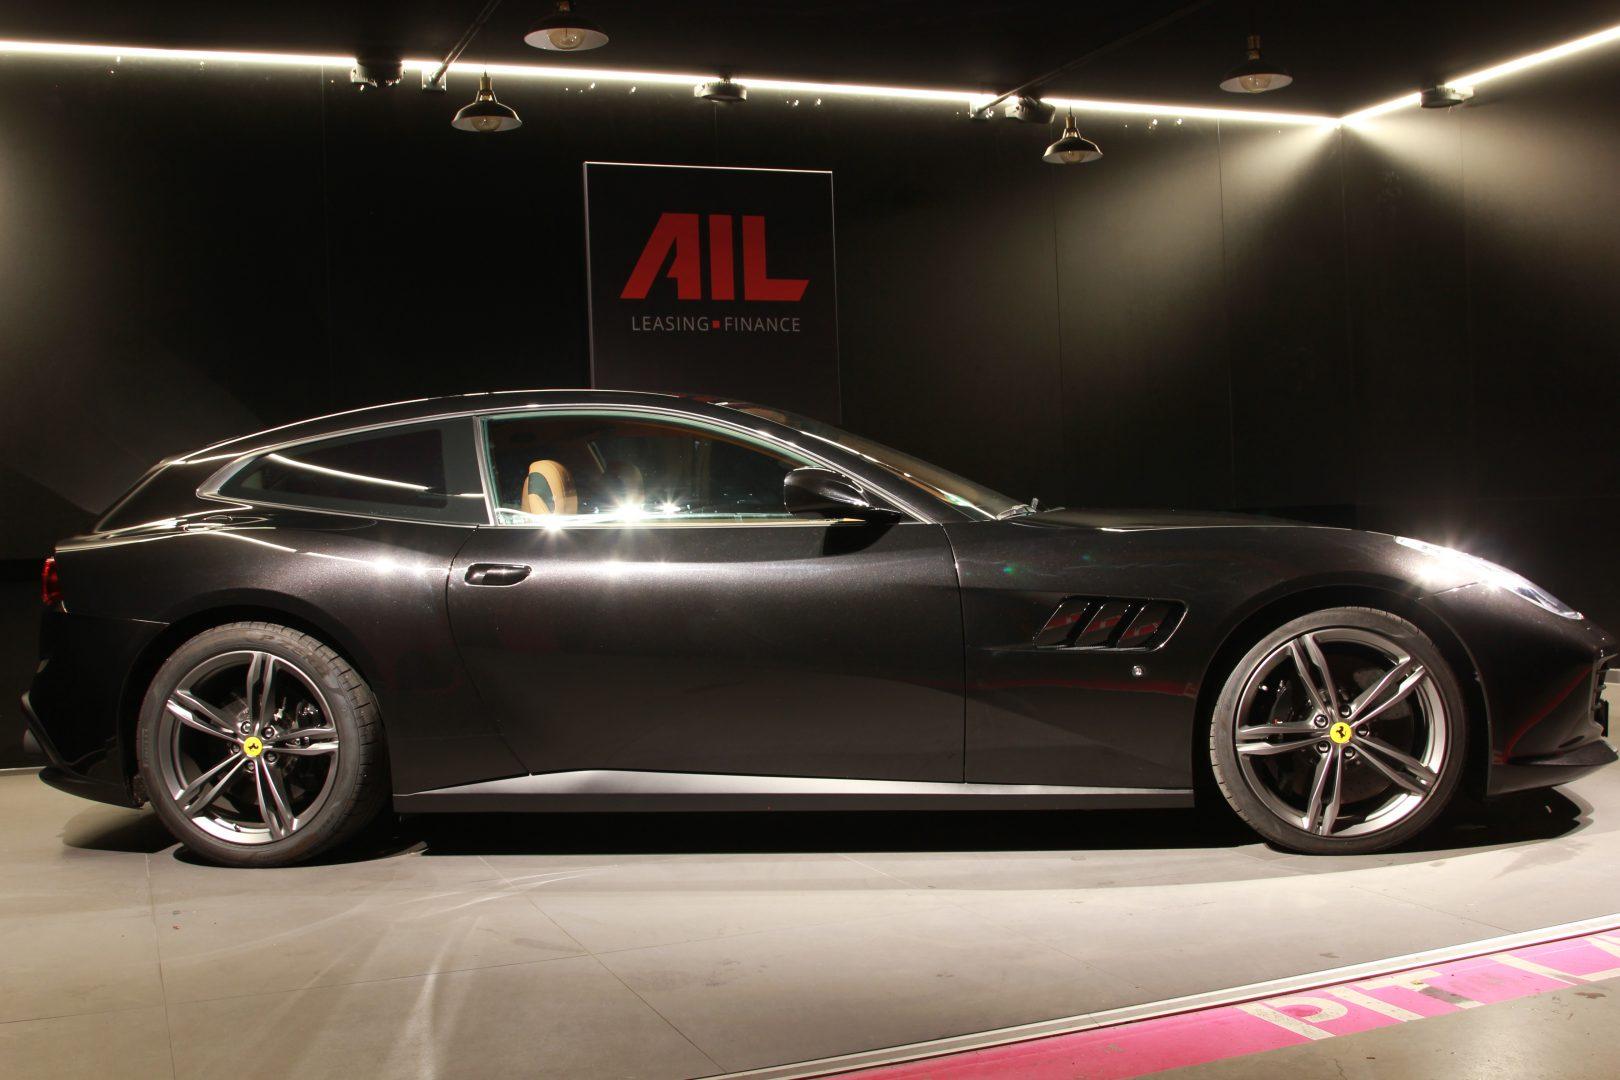 AIL Ferrari GTC4Lusso 7